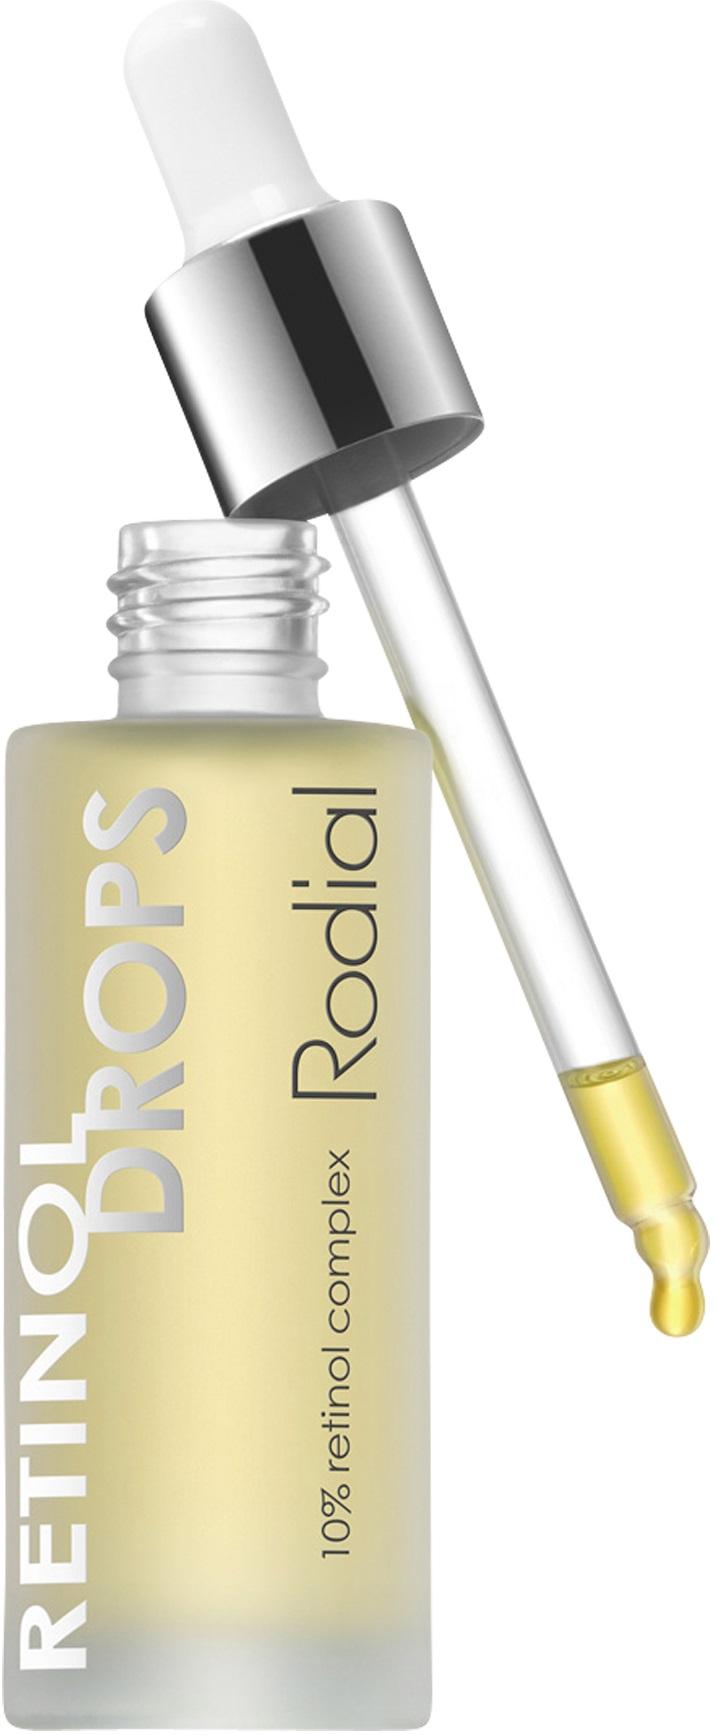 Rodial - Retinol 10% Booster Drops